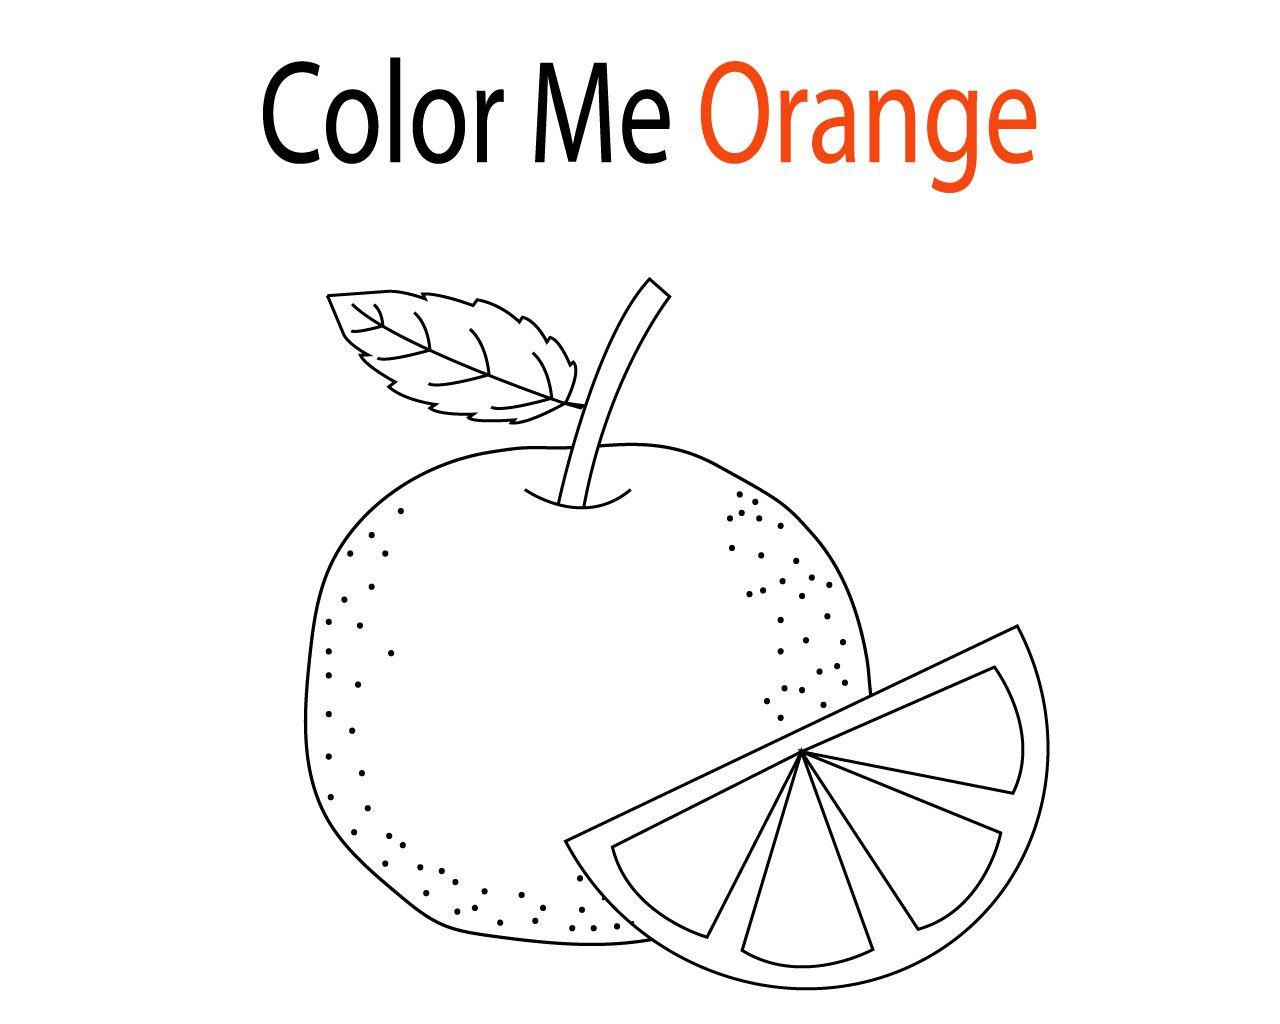 Orange Fruit Coloring Pages Fruit Coloring Pages Coloring Pages Sports Coloring Pages